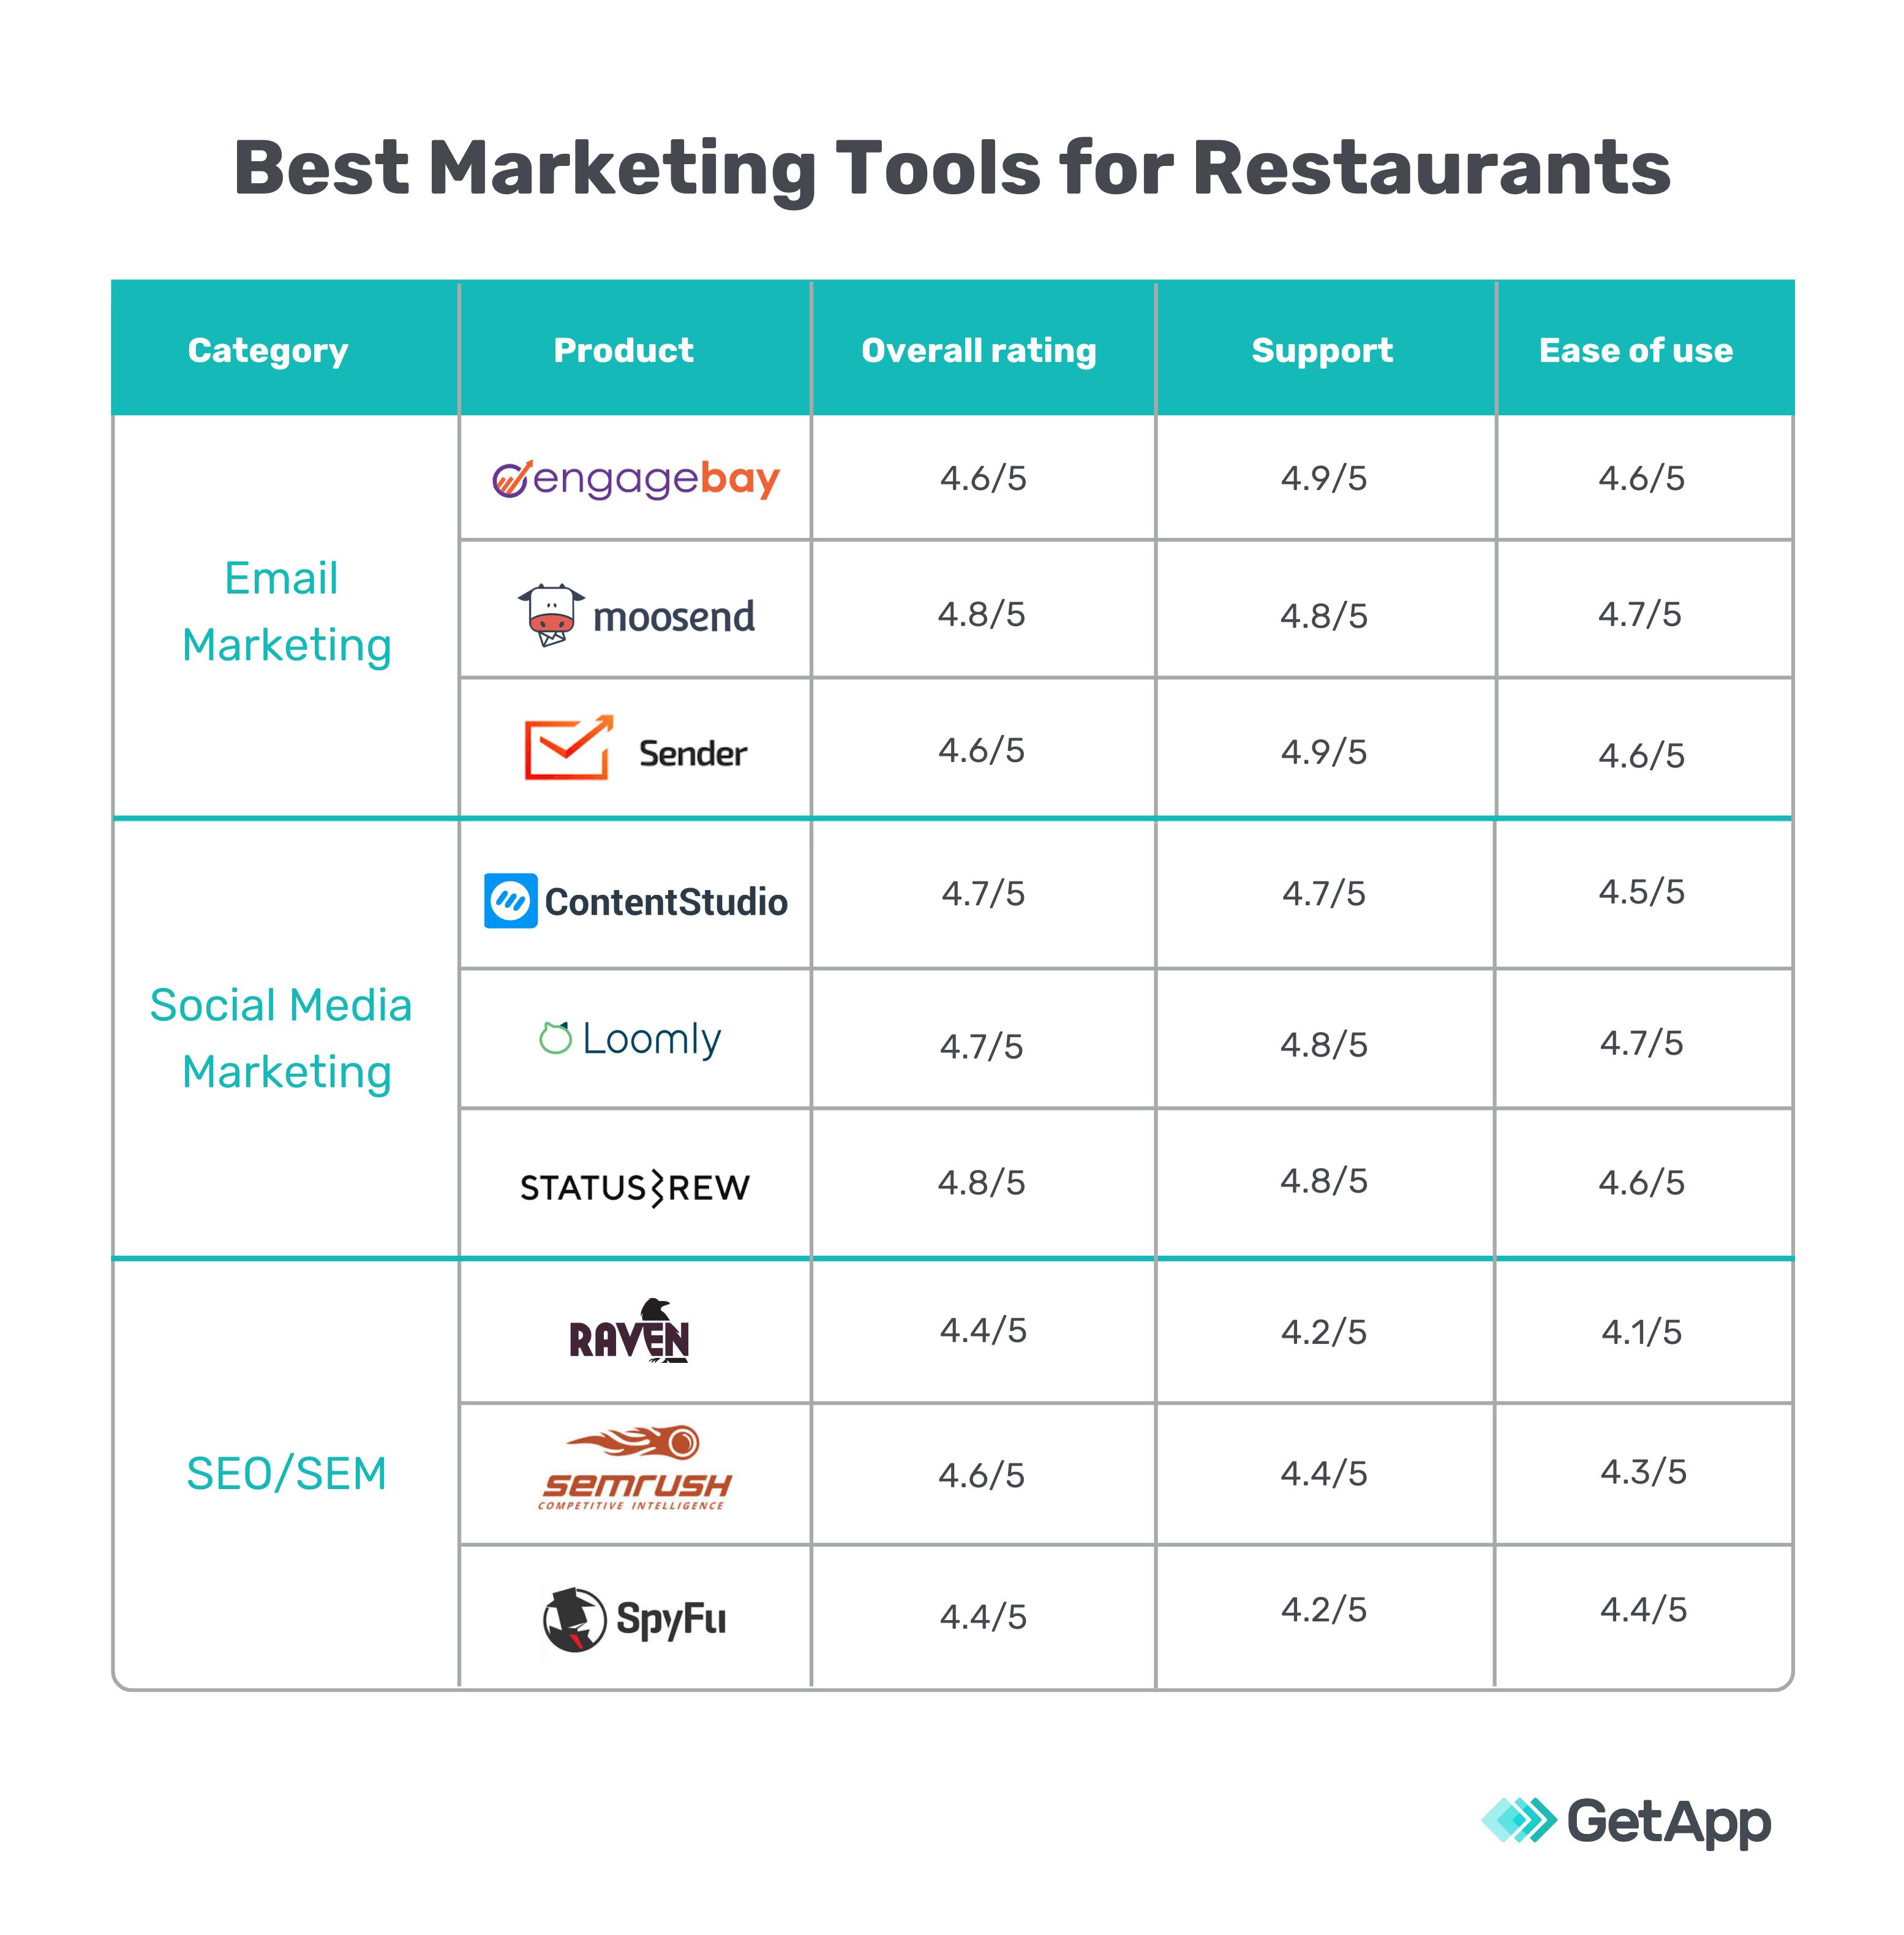 Best marketing tools for restaurants